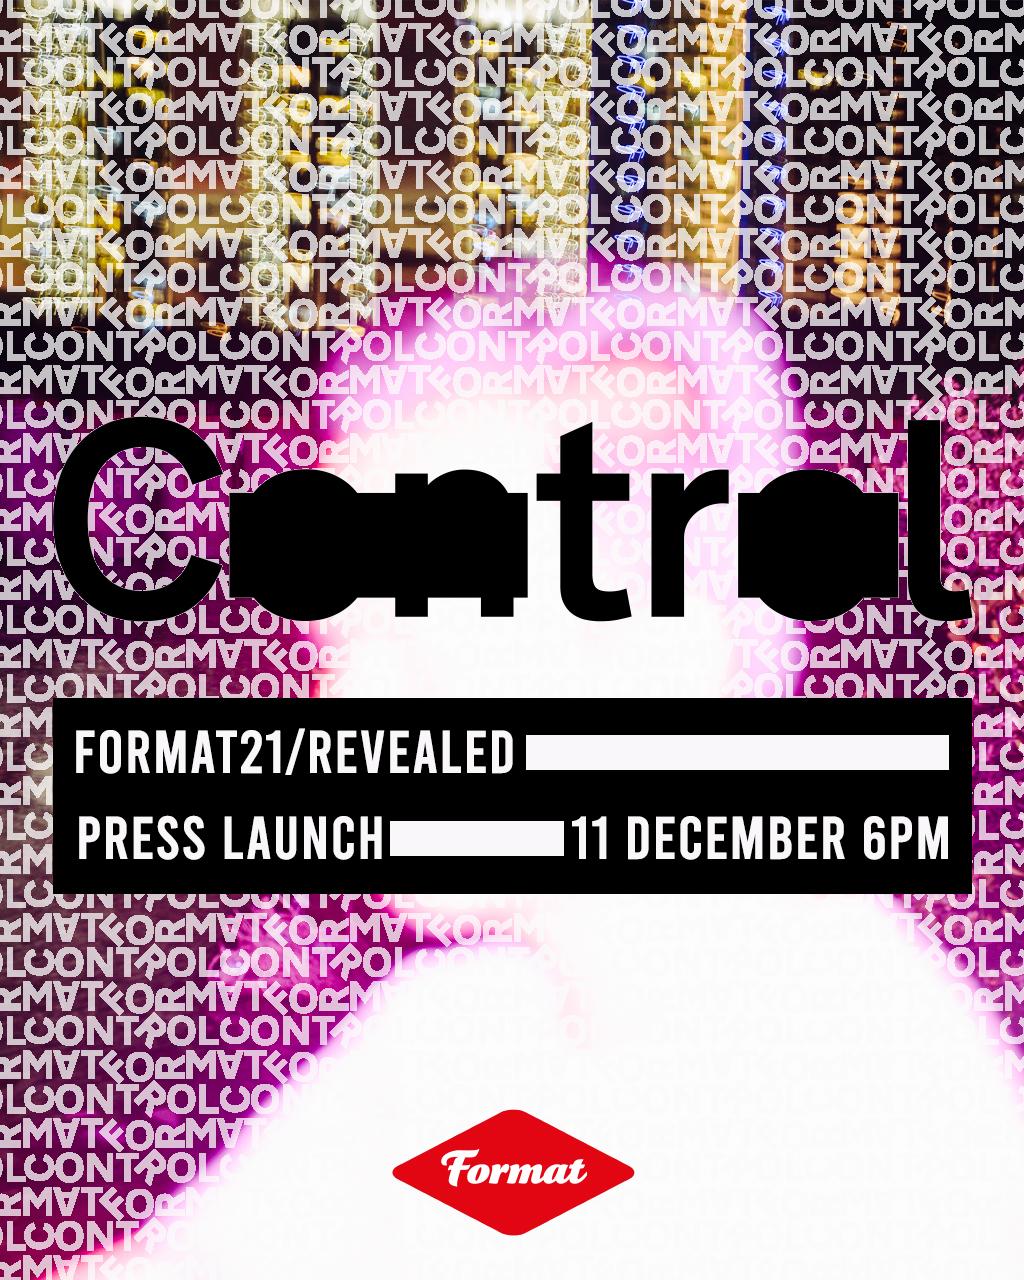 FORMAT Press Launch: 11 December 2020